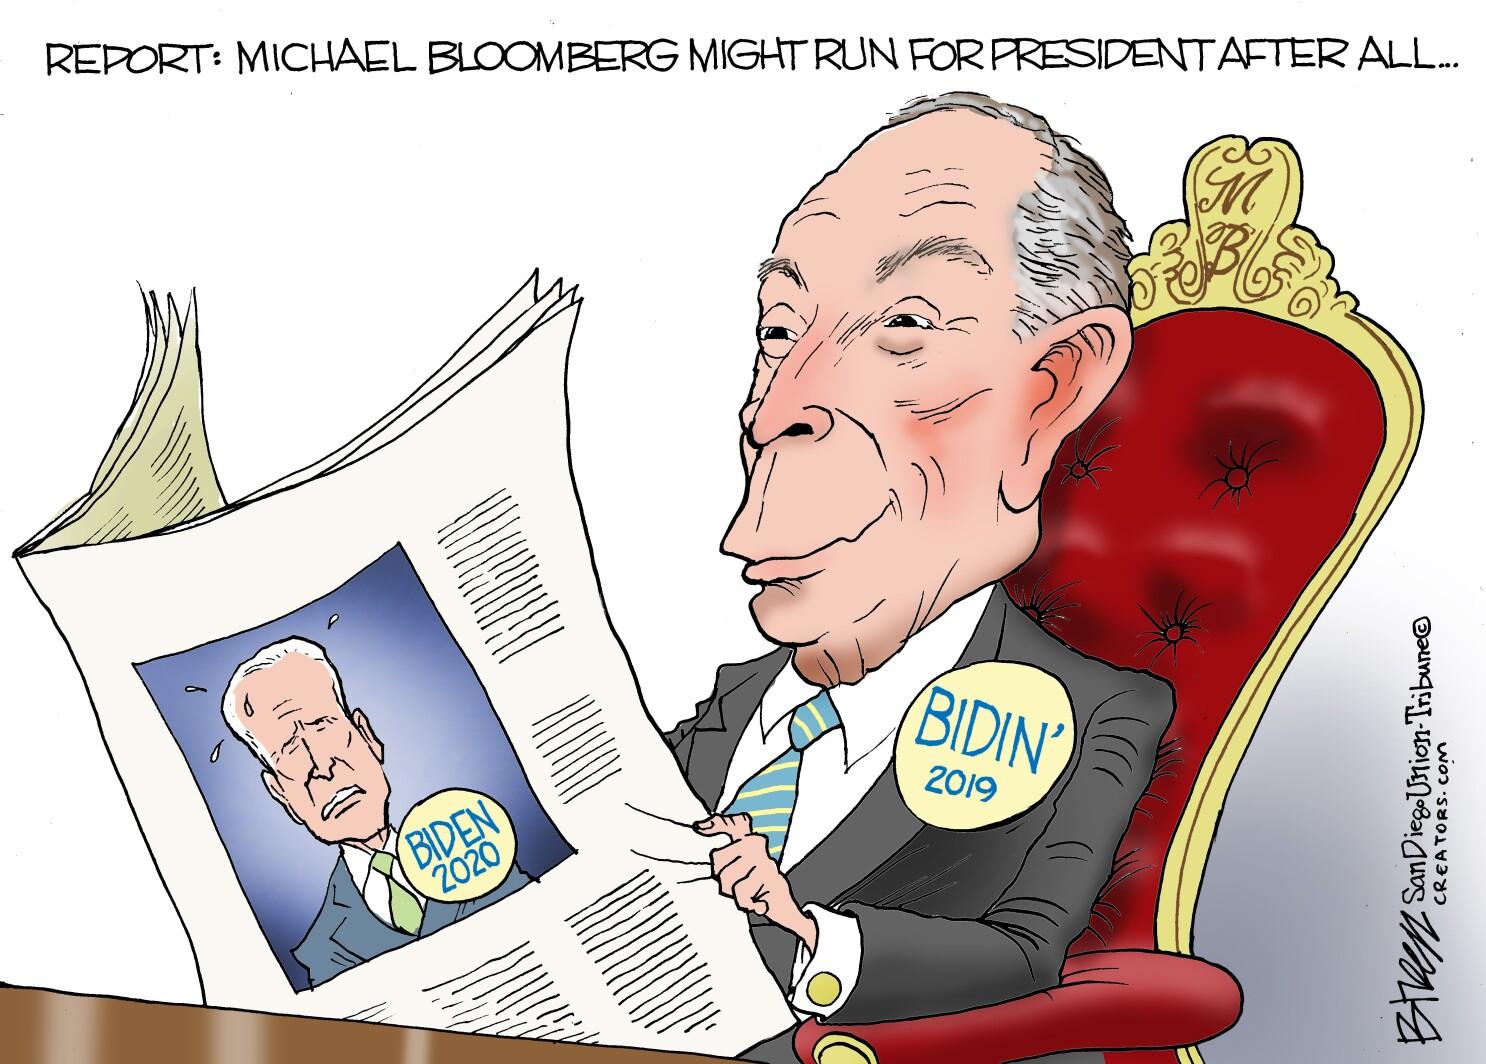 Sources say Michael Bloomberg still mulling 2020 run